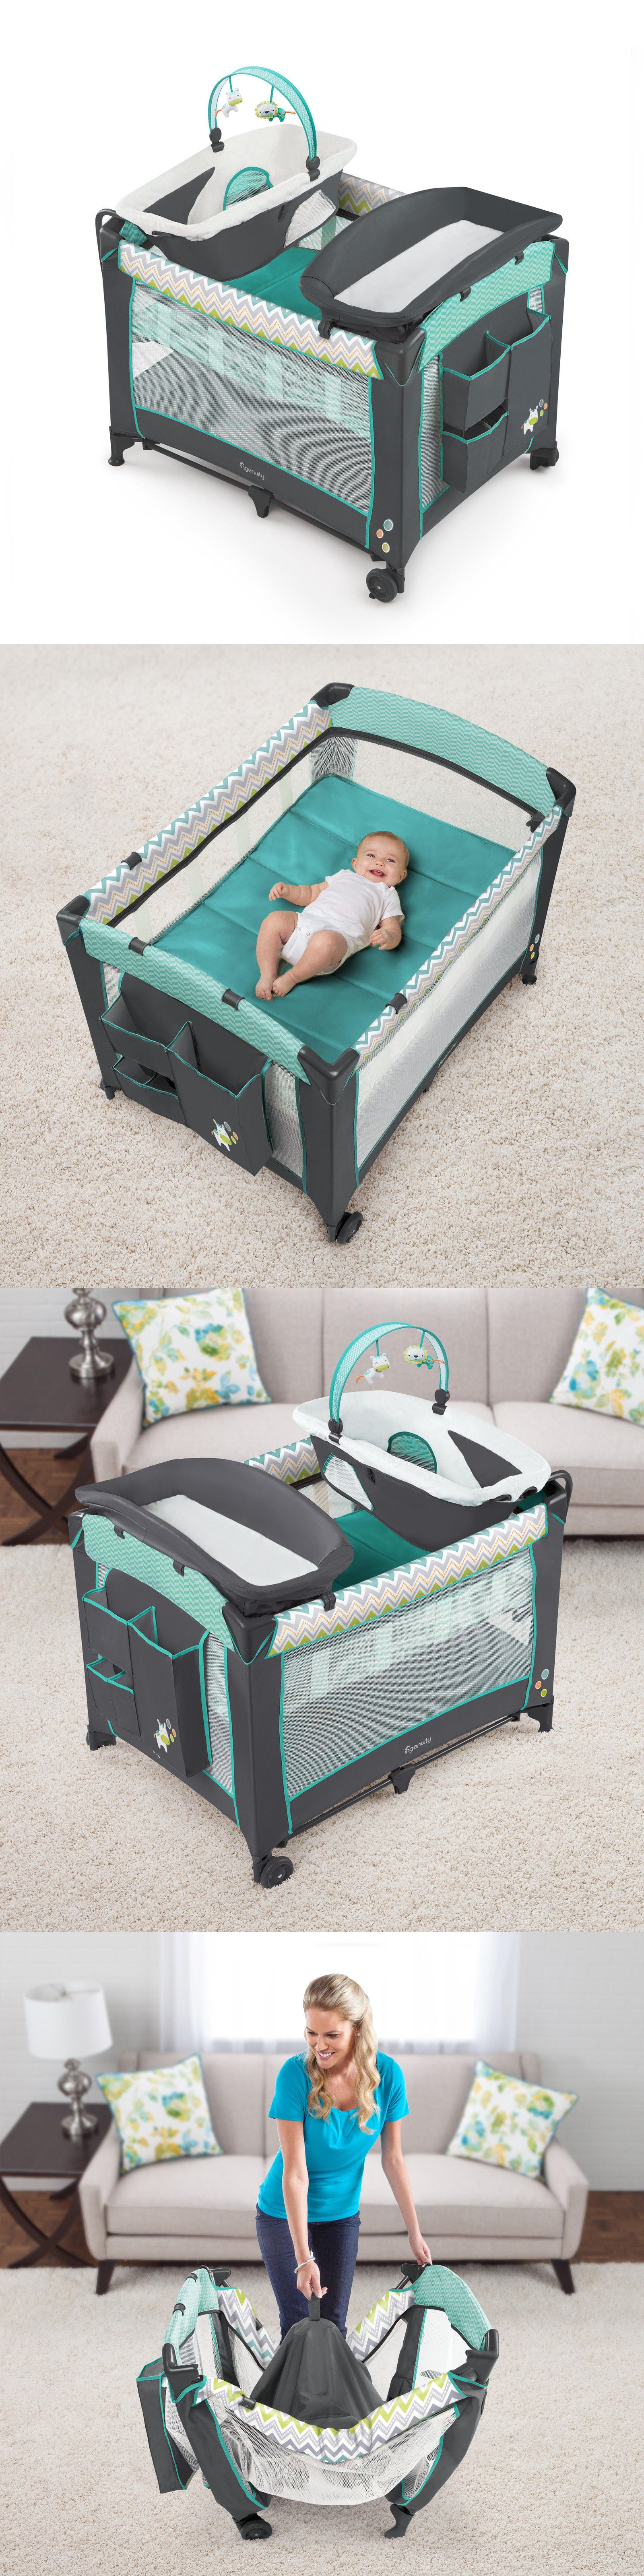 Baby cribs dundas - Baby Nursery Baby Nursery Bassinet Infant Sleeper Crib Newborn Playard Folding Changing Table Buy It